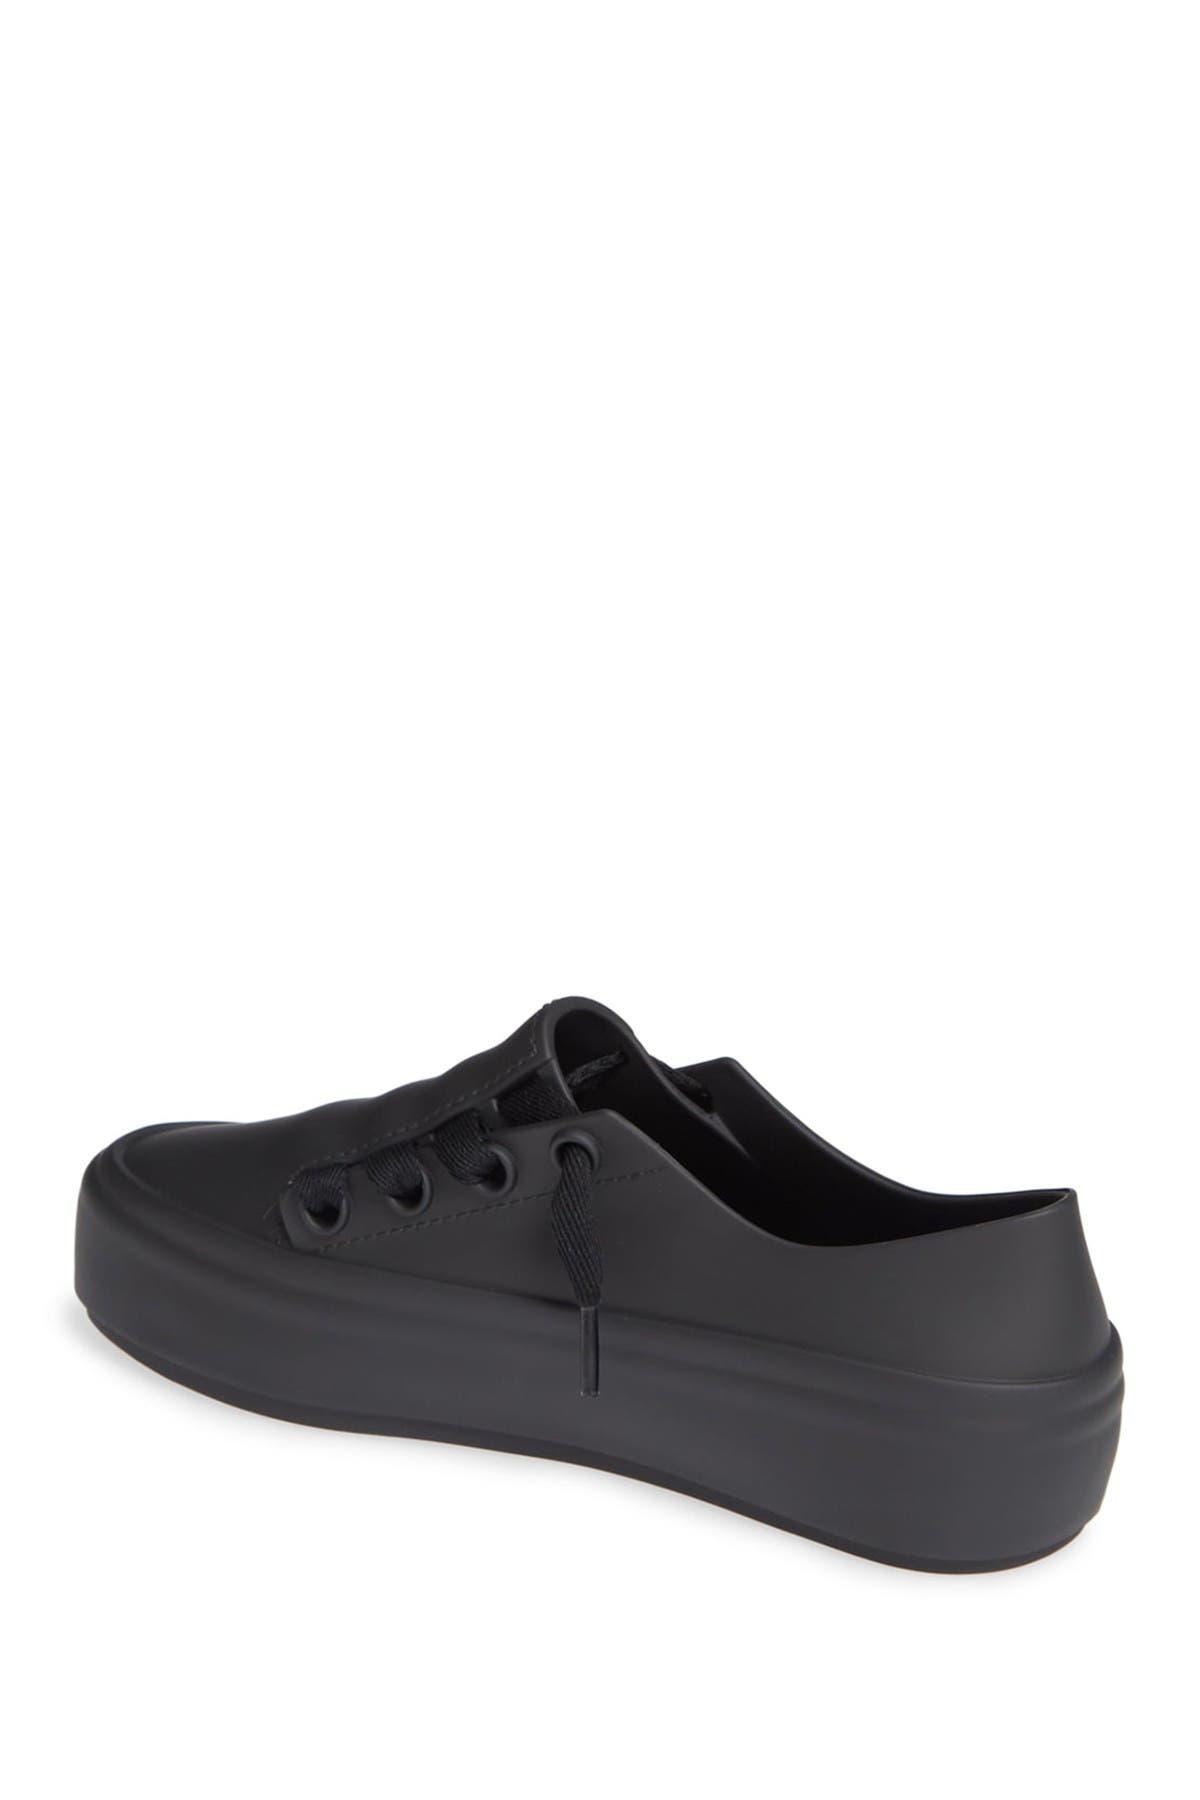 Mini Melissa | Mini Ulitsa Sneaker